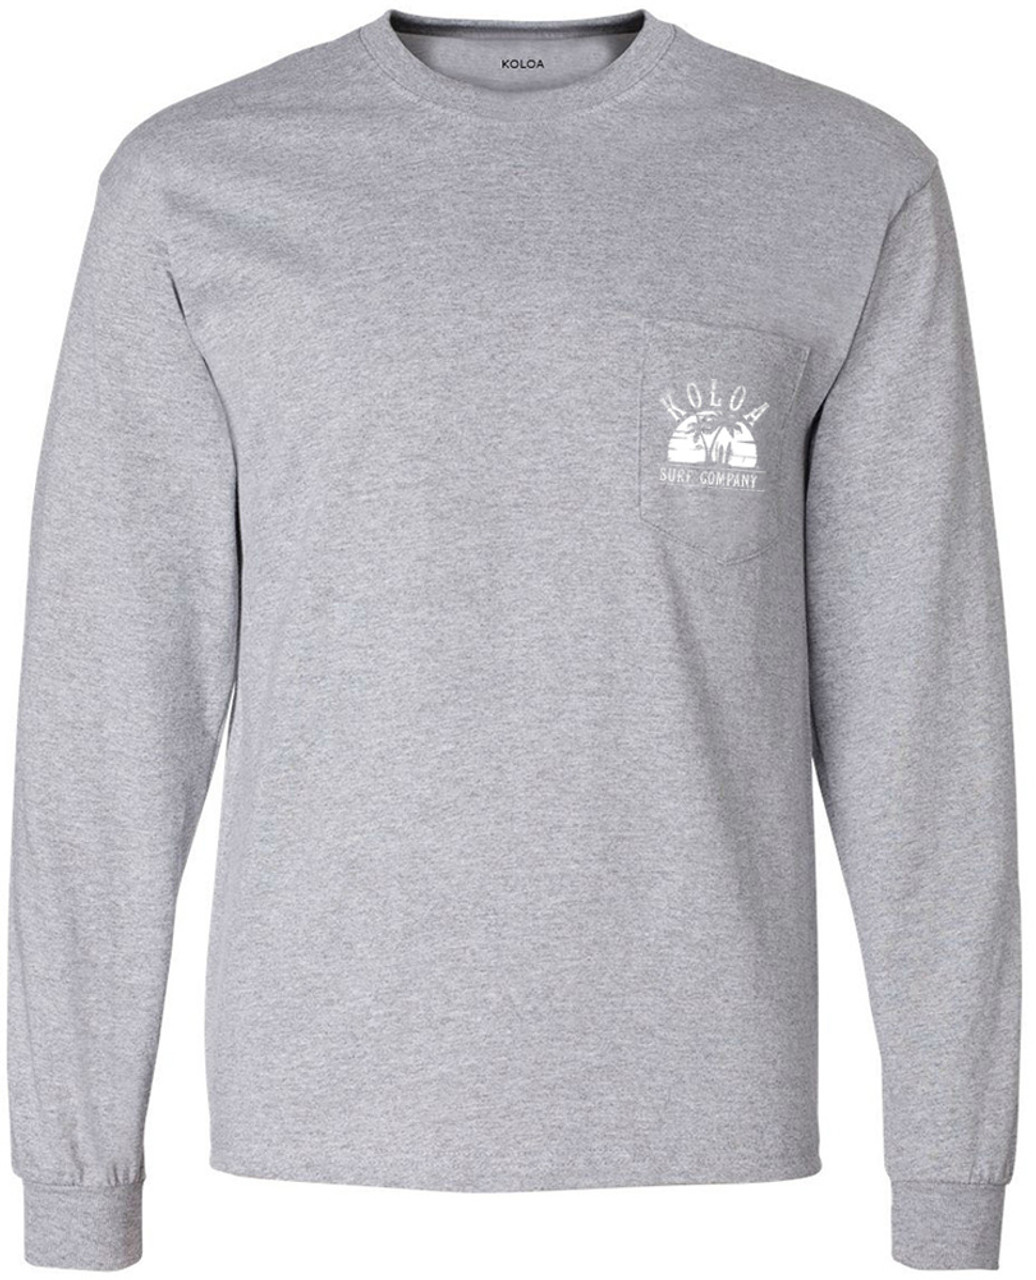 Hawaiian Palm Tree and Sea Turtle Adult Mens Sports Long Sleeve Sweater T-Shirts